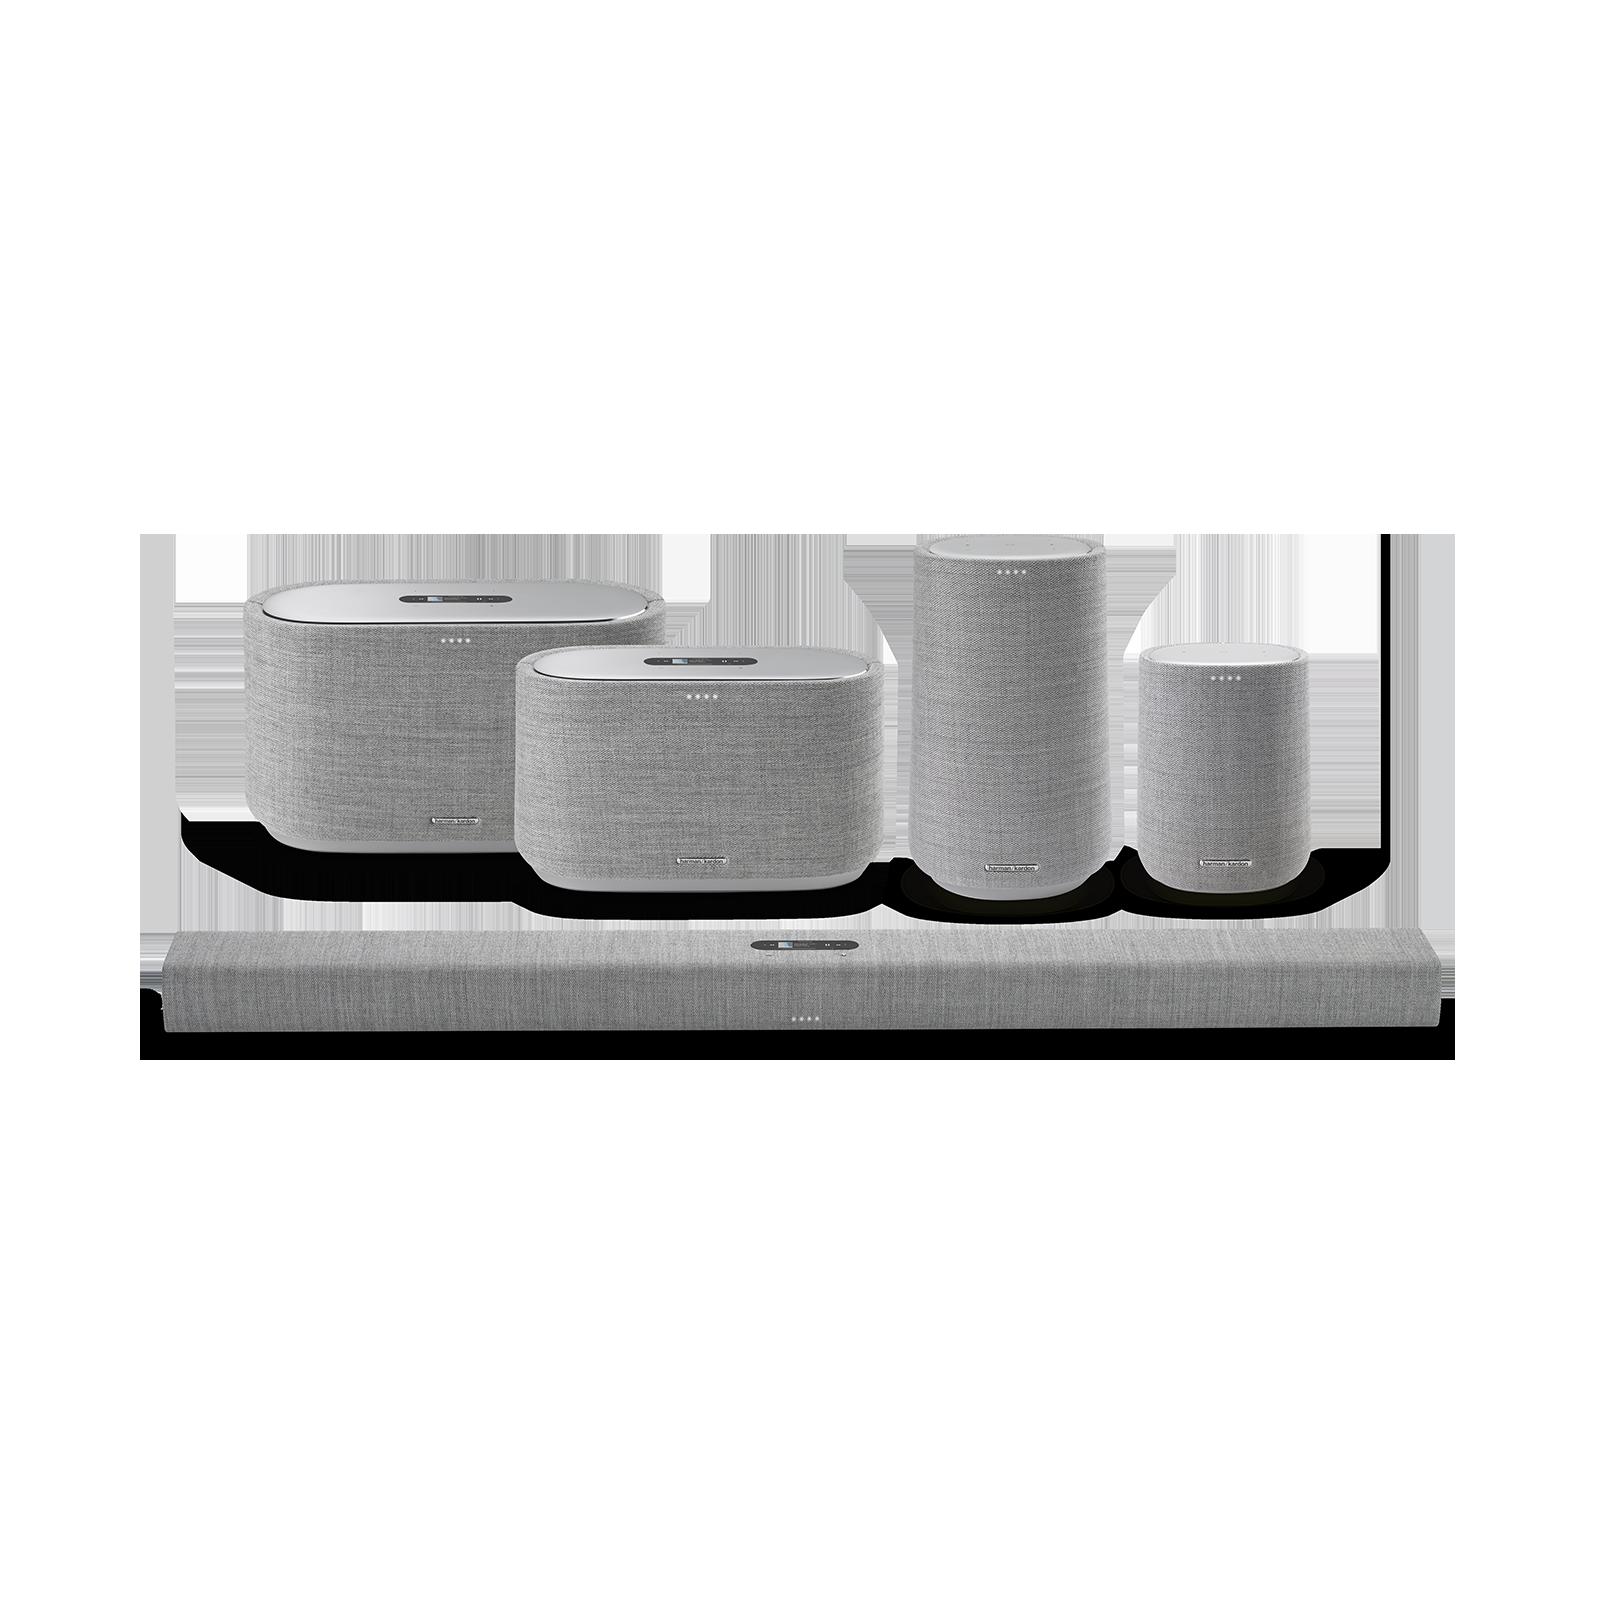 Harman Kardon Citation 300 - Grey - The medium-size smart home speaker with award winning design - Detailshot 5